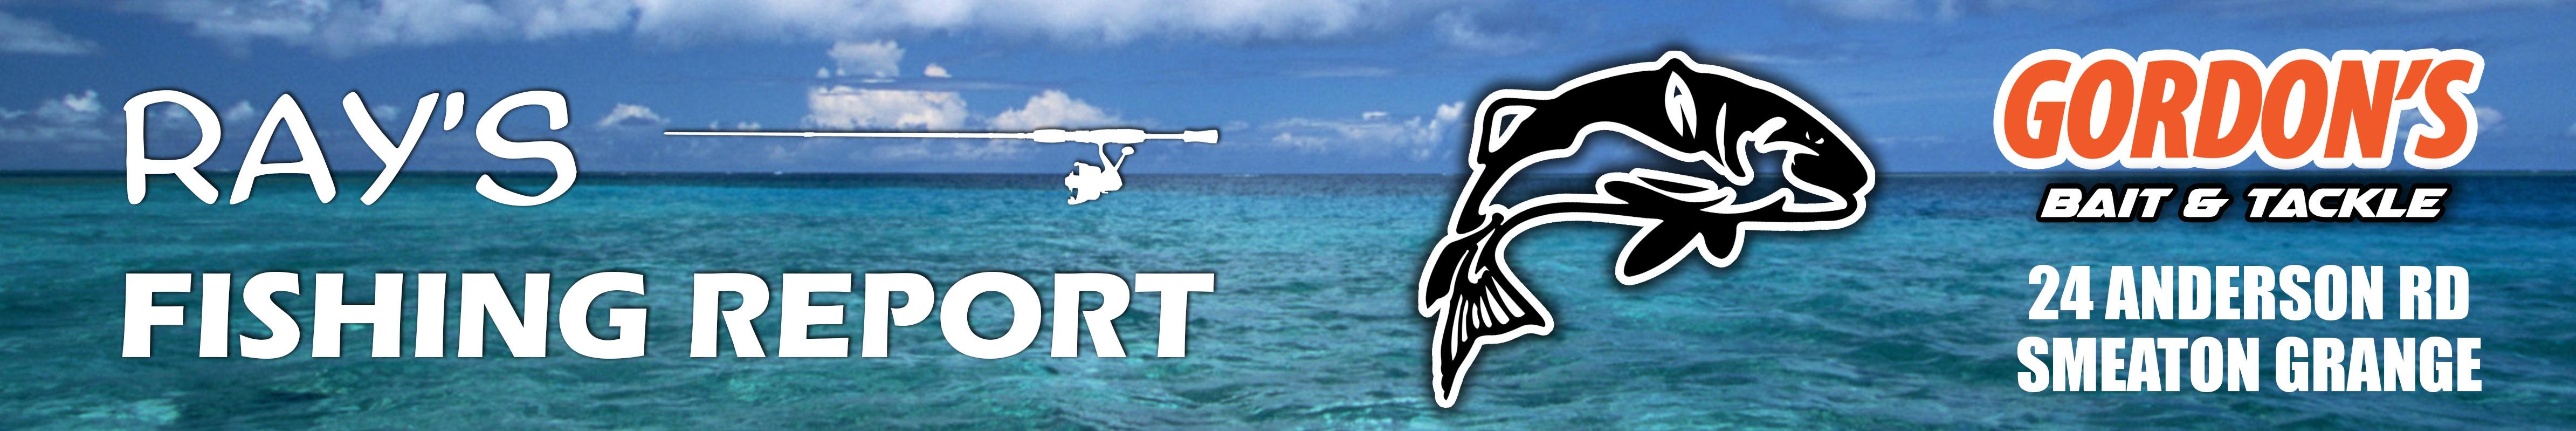 ray-fish-report.jpg